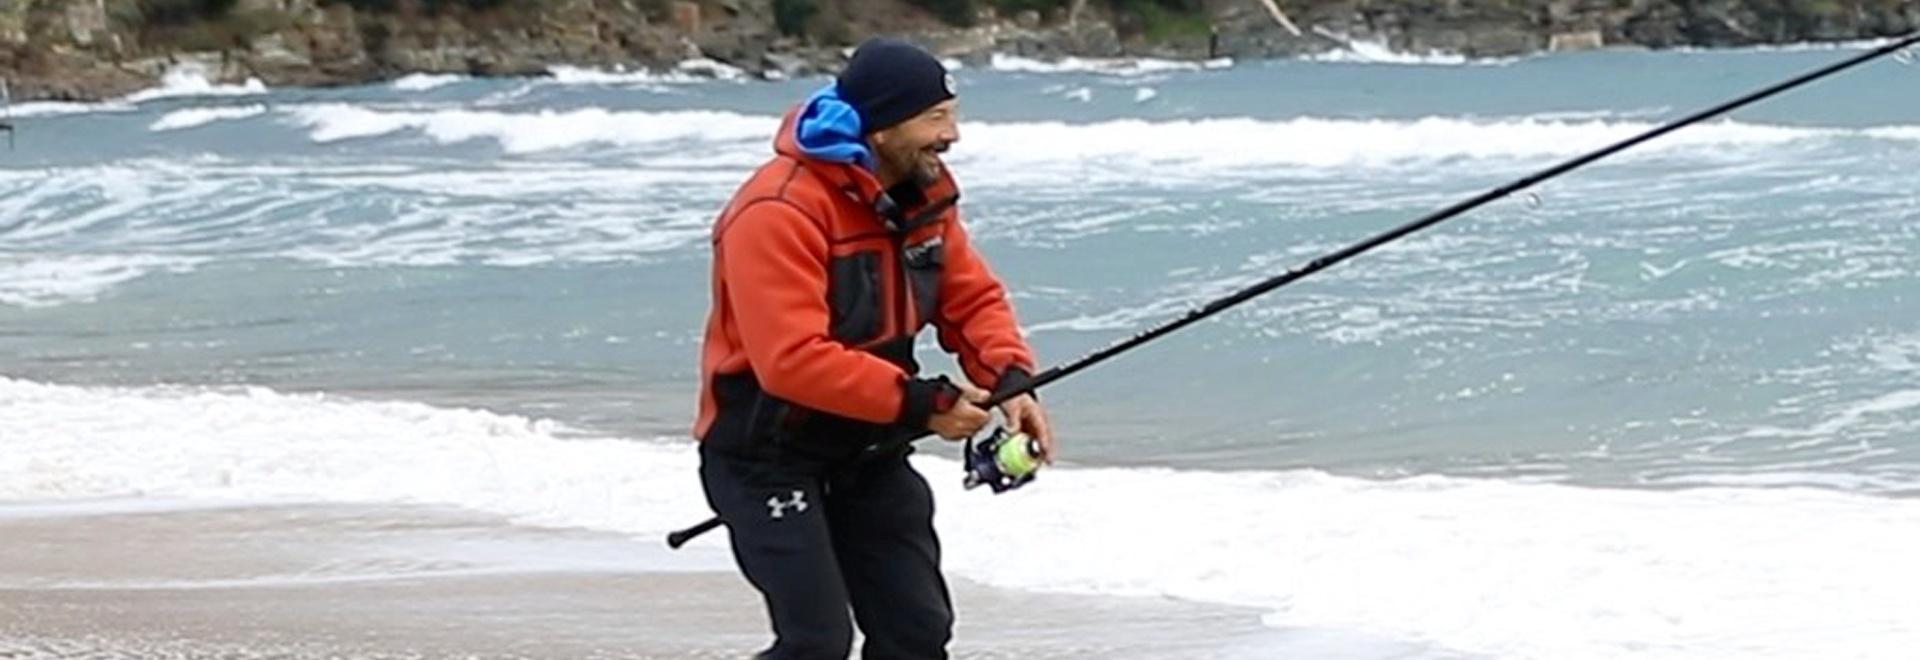 Surfcasting Specialist